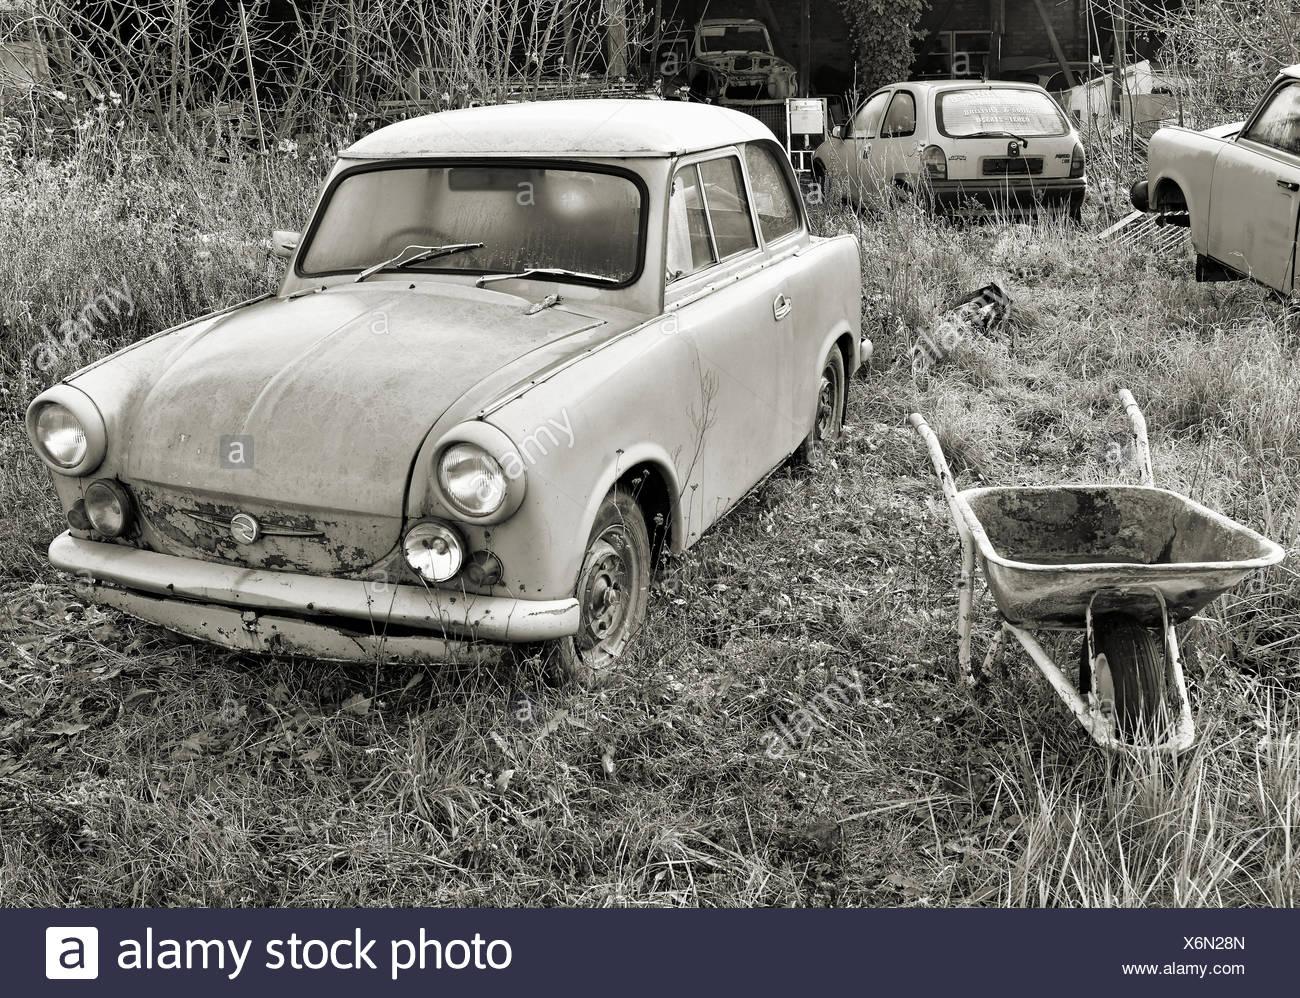 ein altes kaputtes auto stockfoto bild 279516629 alamy. Black Bedroom Furniture Sets. Home Design Ideas